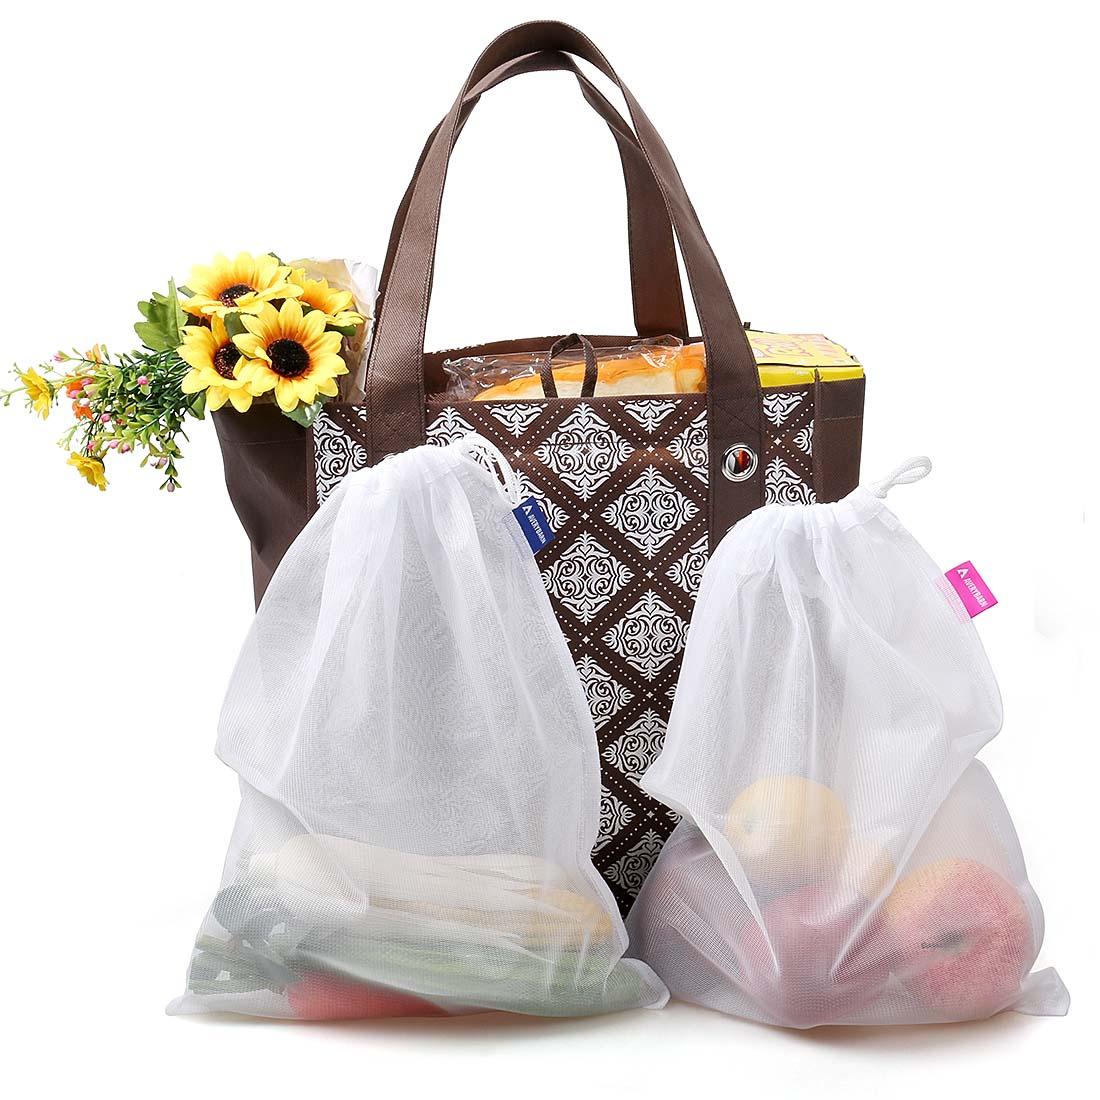 avery barn 10pc grommet reinforced reusable grocery shopping produce bag set ebay. Black Bedroom Furniture Sets. Home Design Ideas